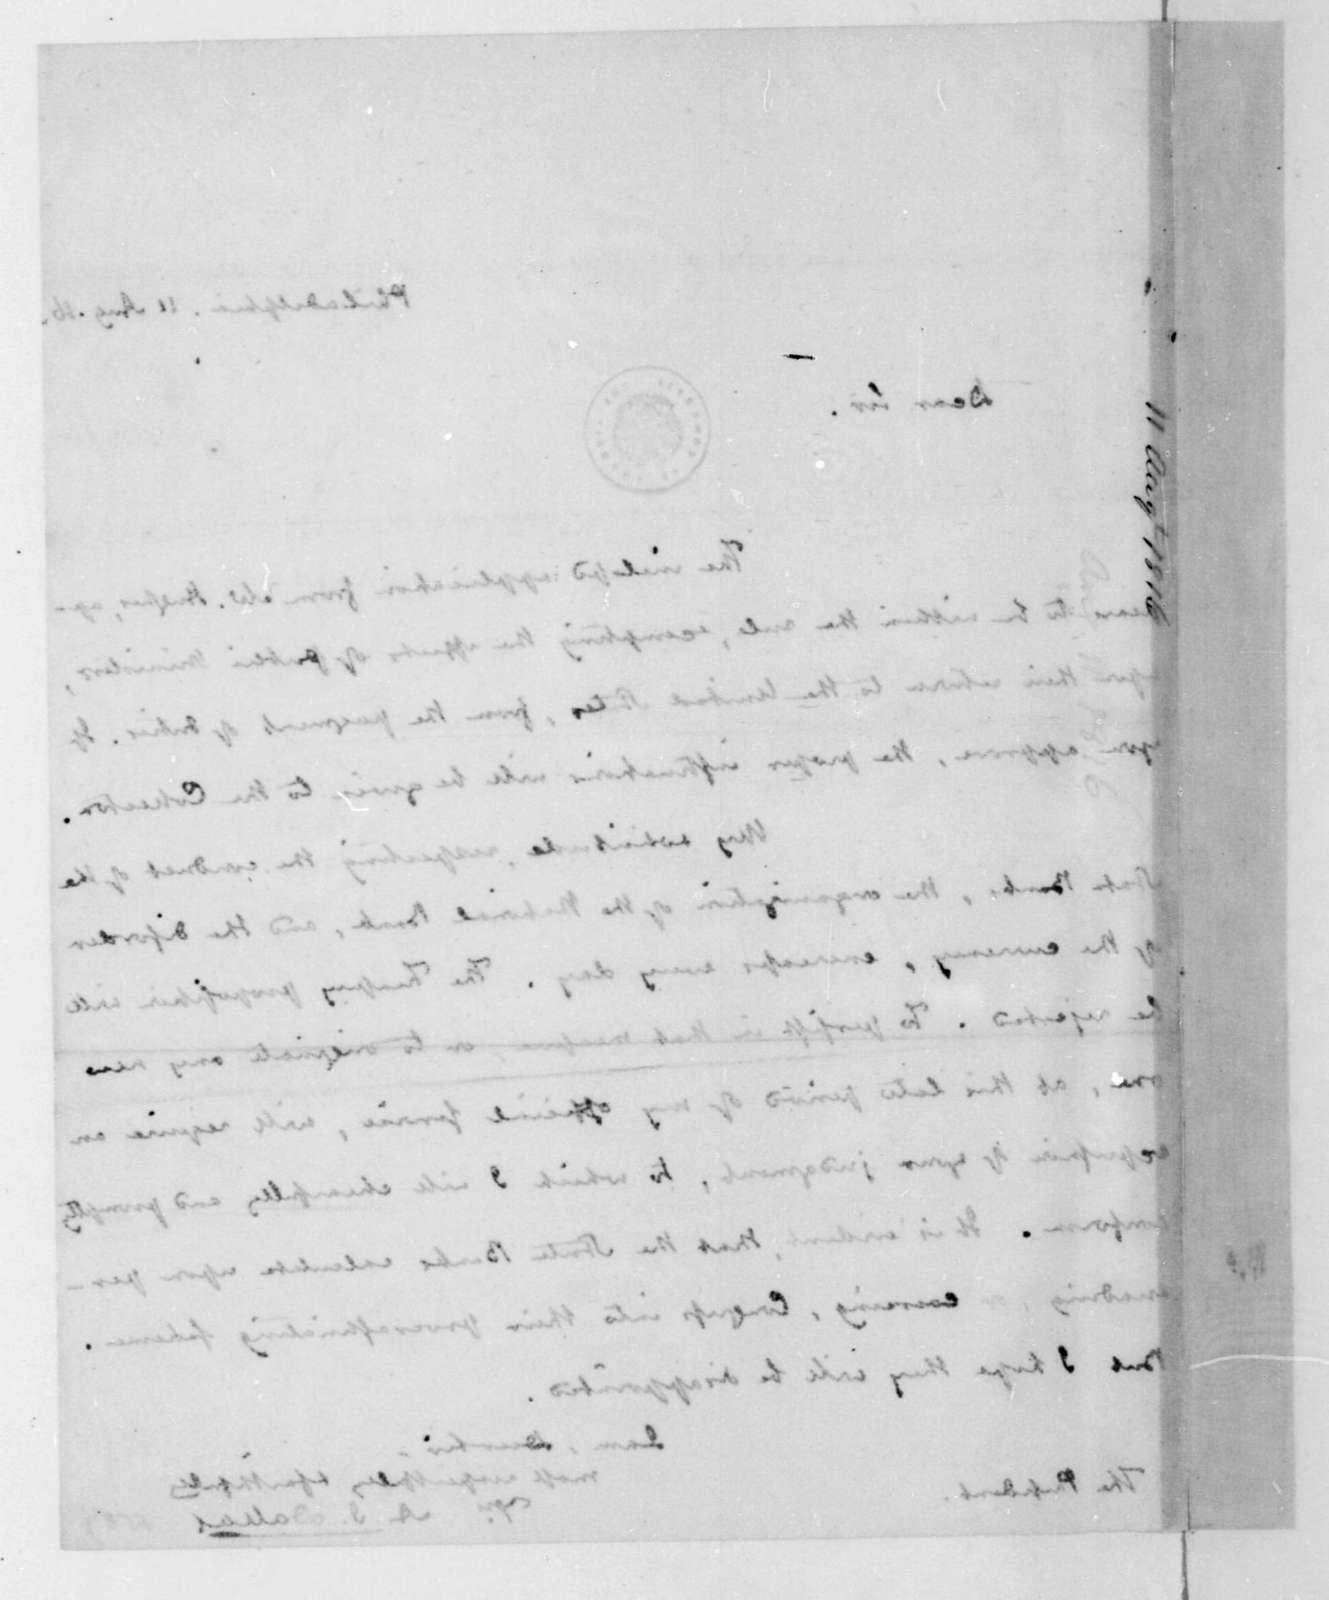 Alexander J. Dallas to James Madison, August 11, 1816.